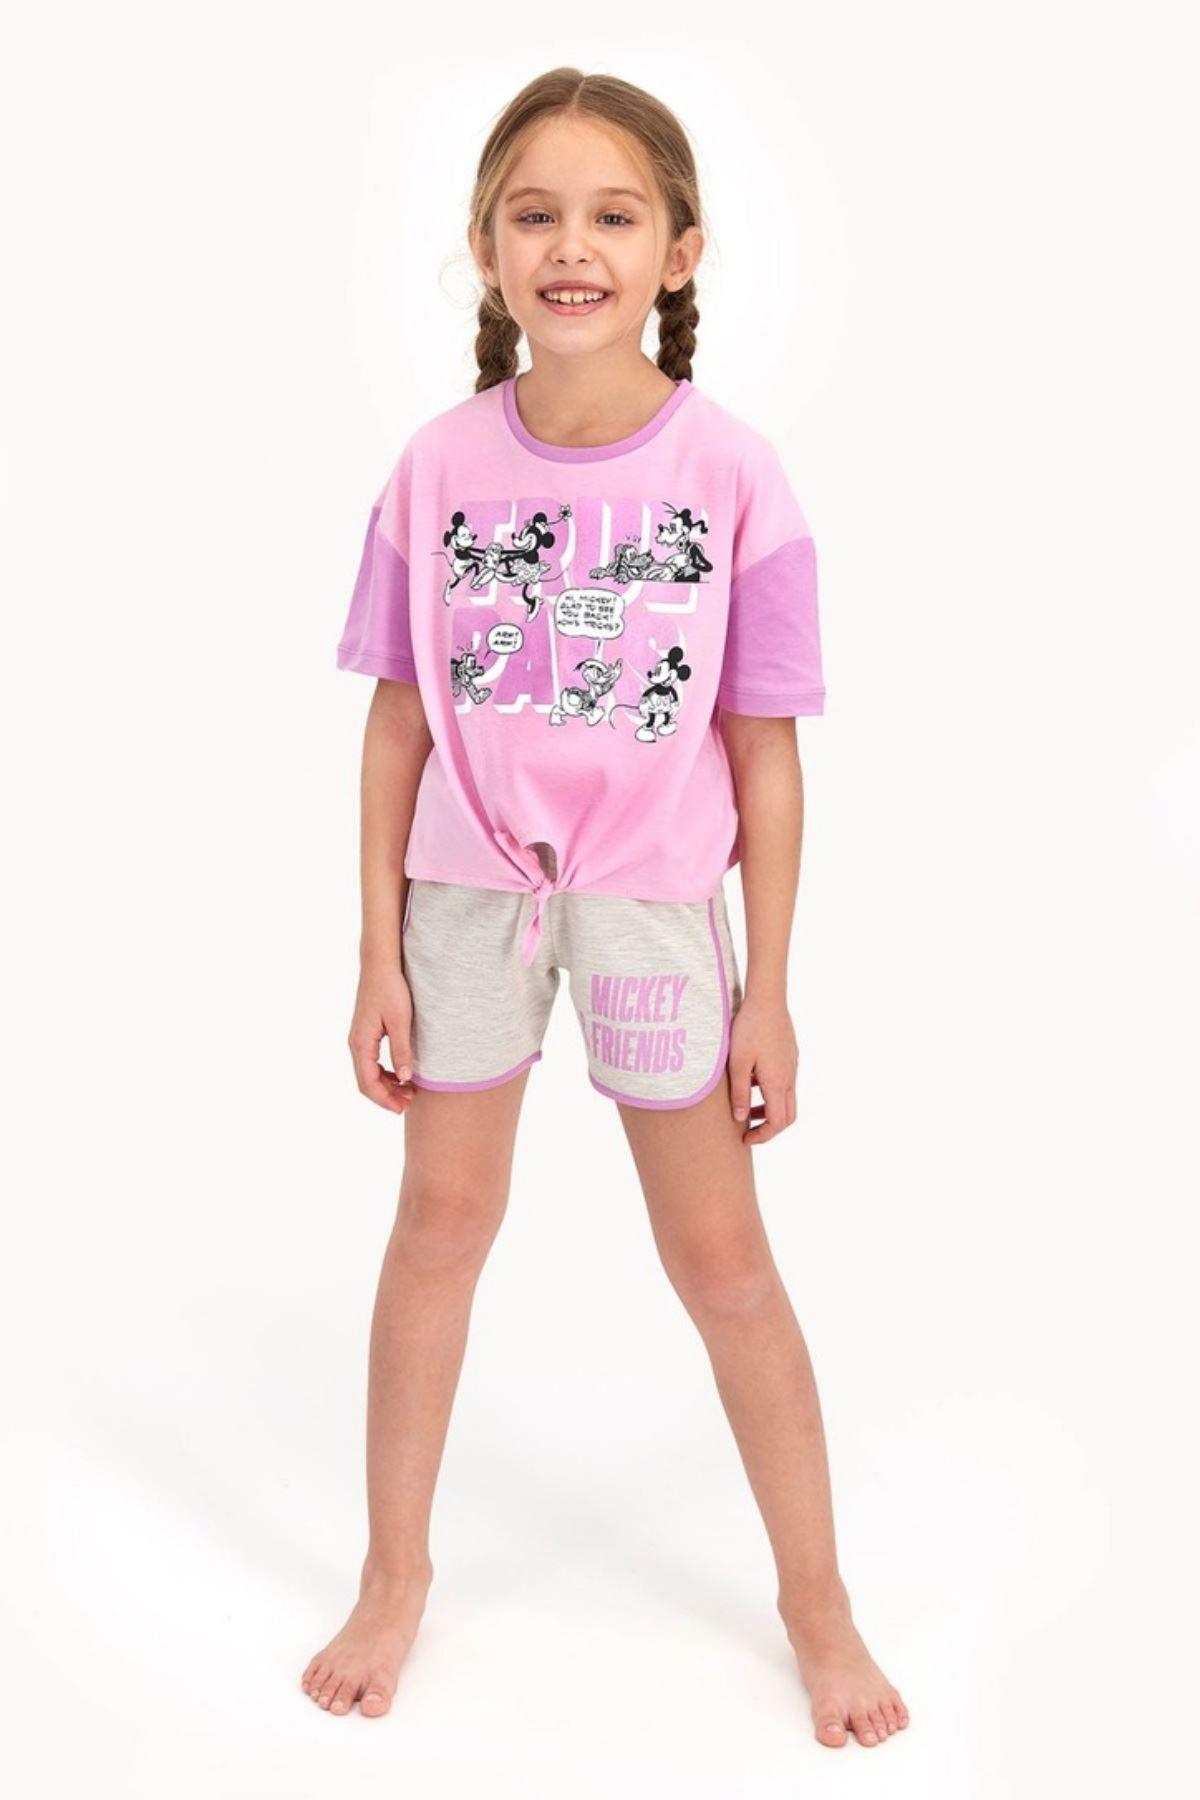 Mickey Mouse Şortlu  Kız Çocuk Takım - Toz Pembe